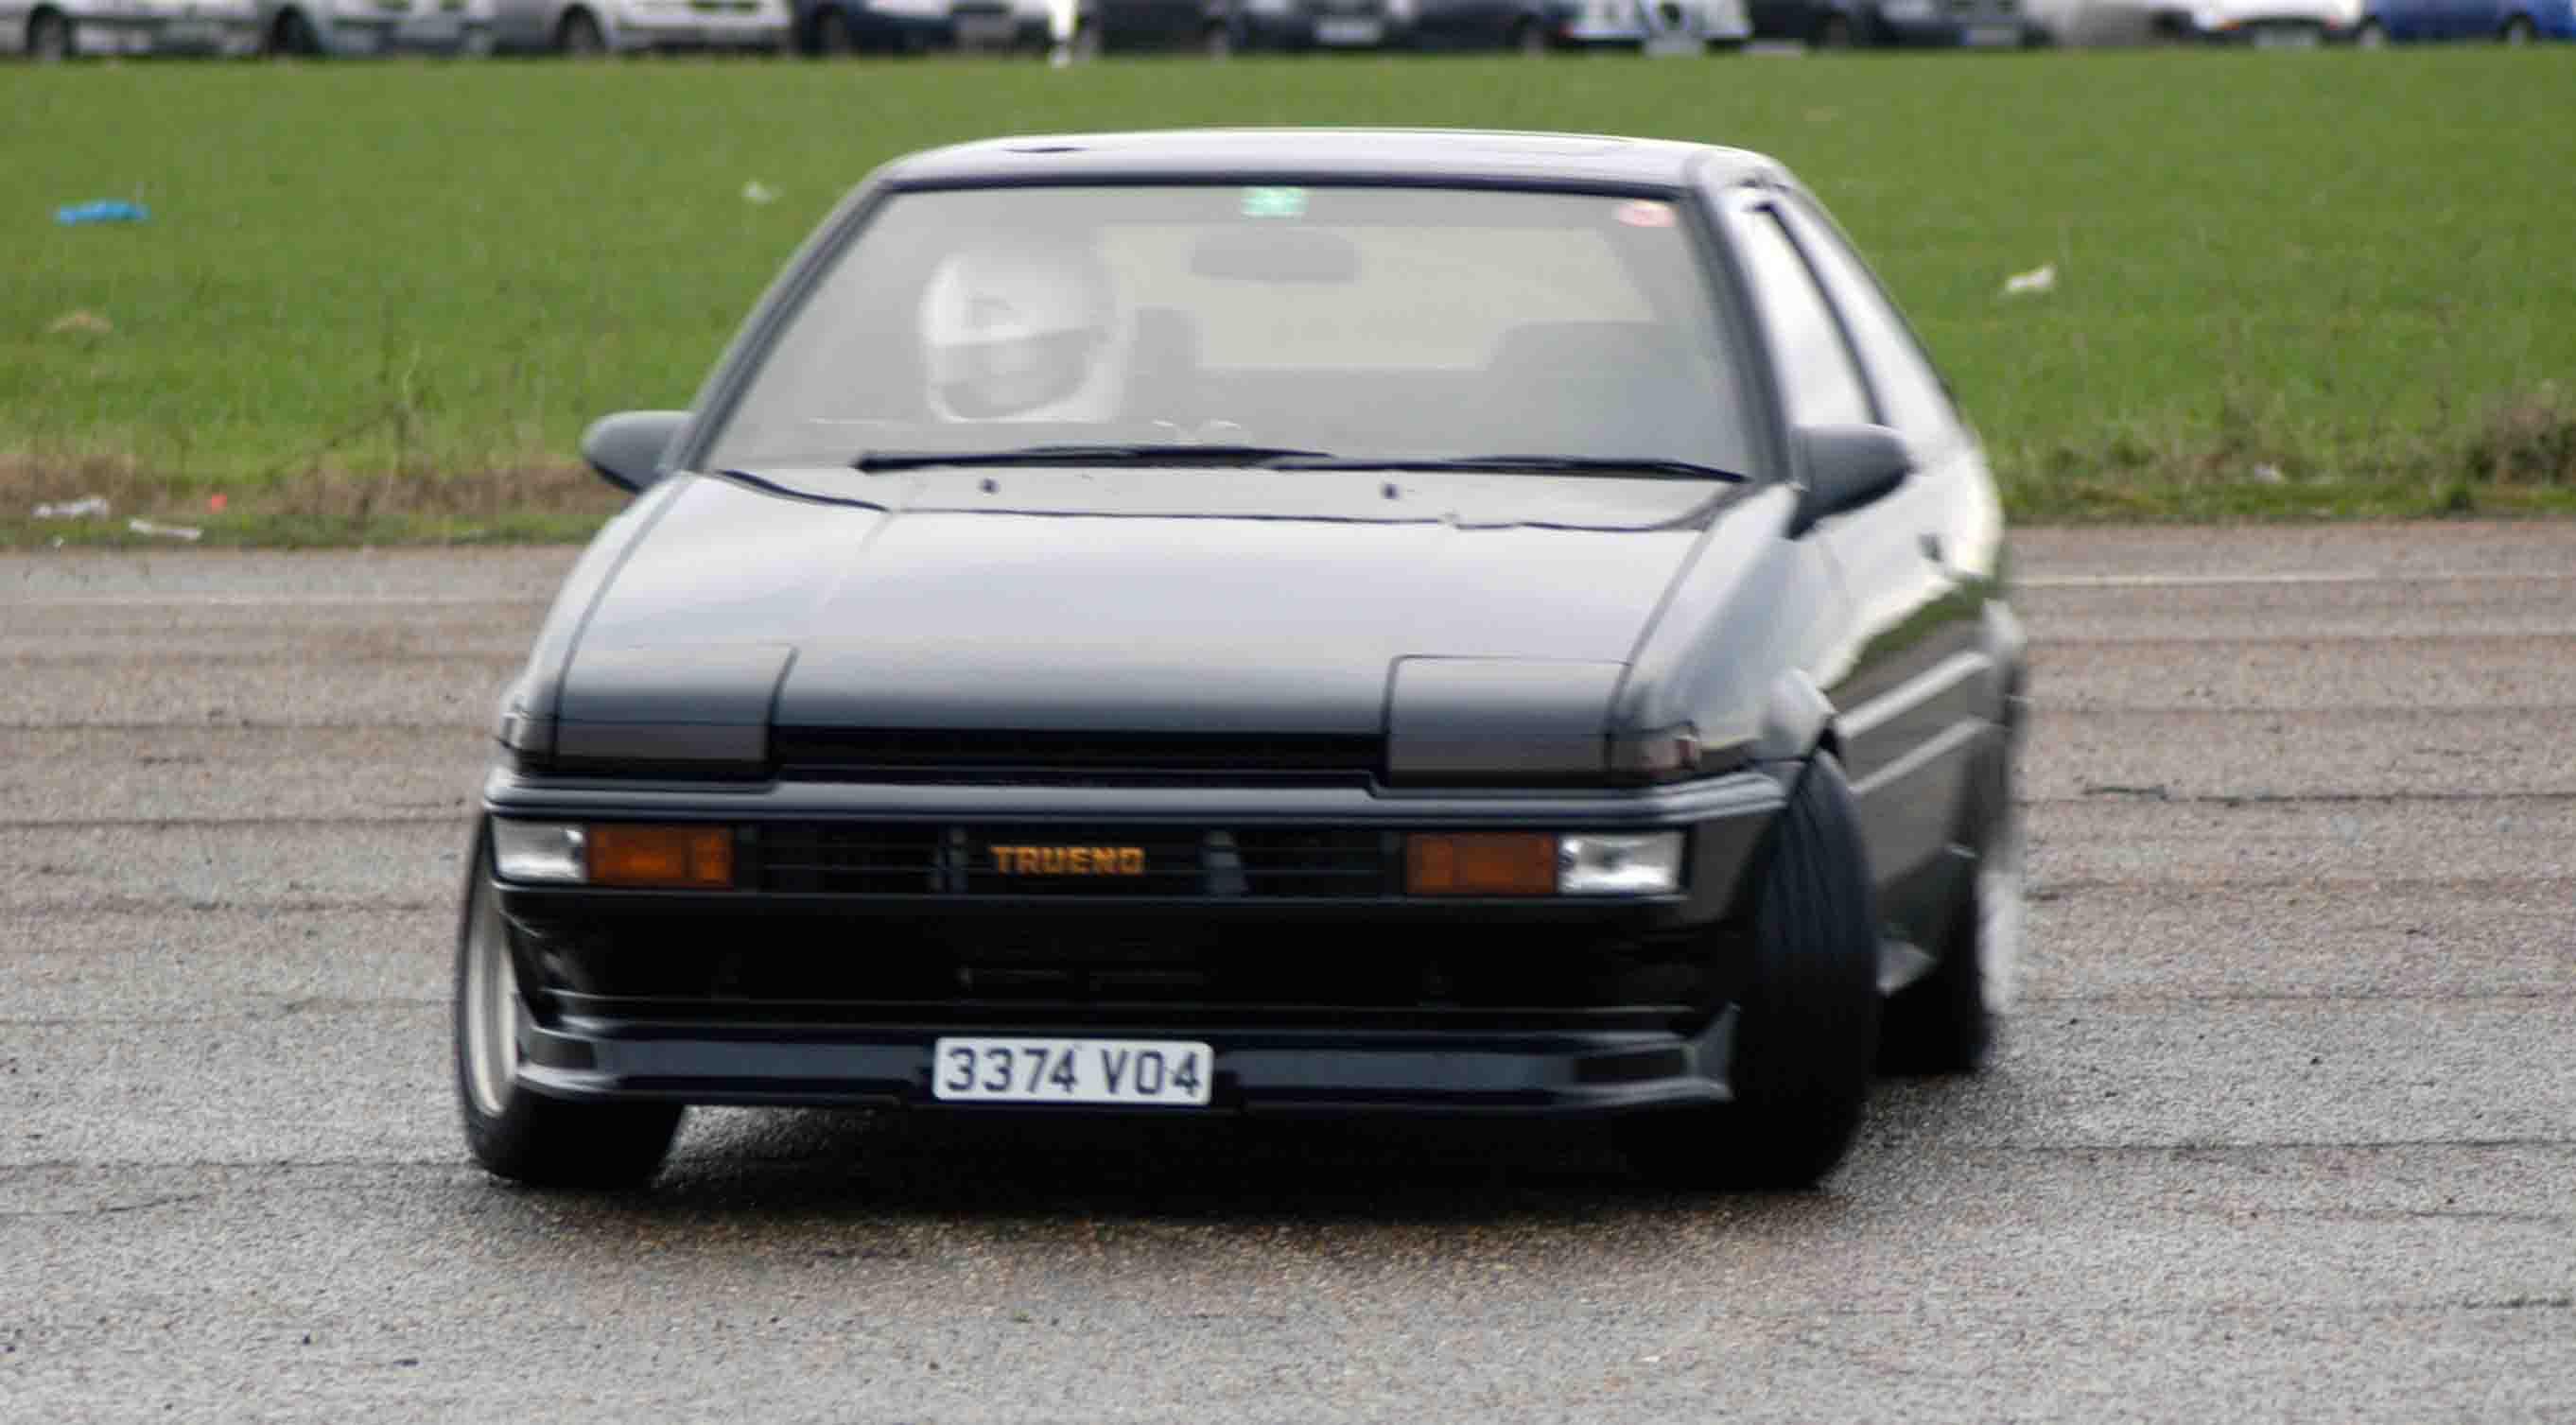 [Image: AEU86 AE86 - Toyota revives Black Limited 86]